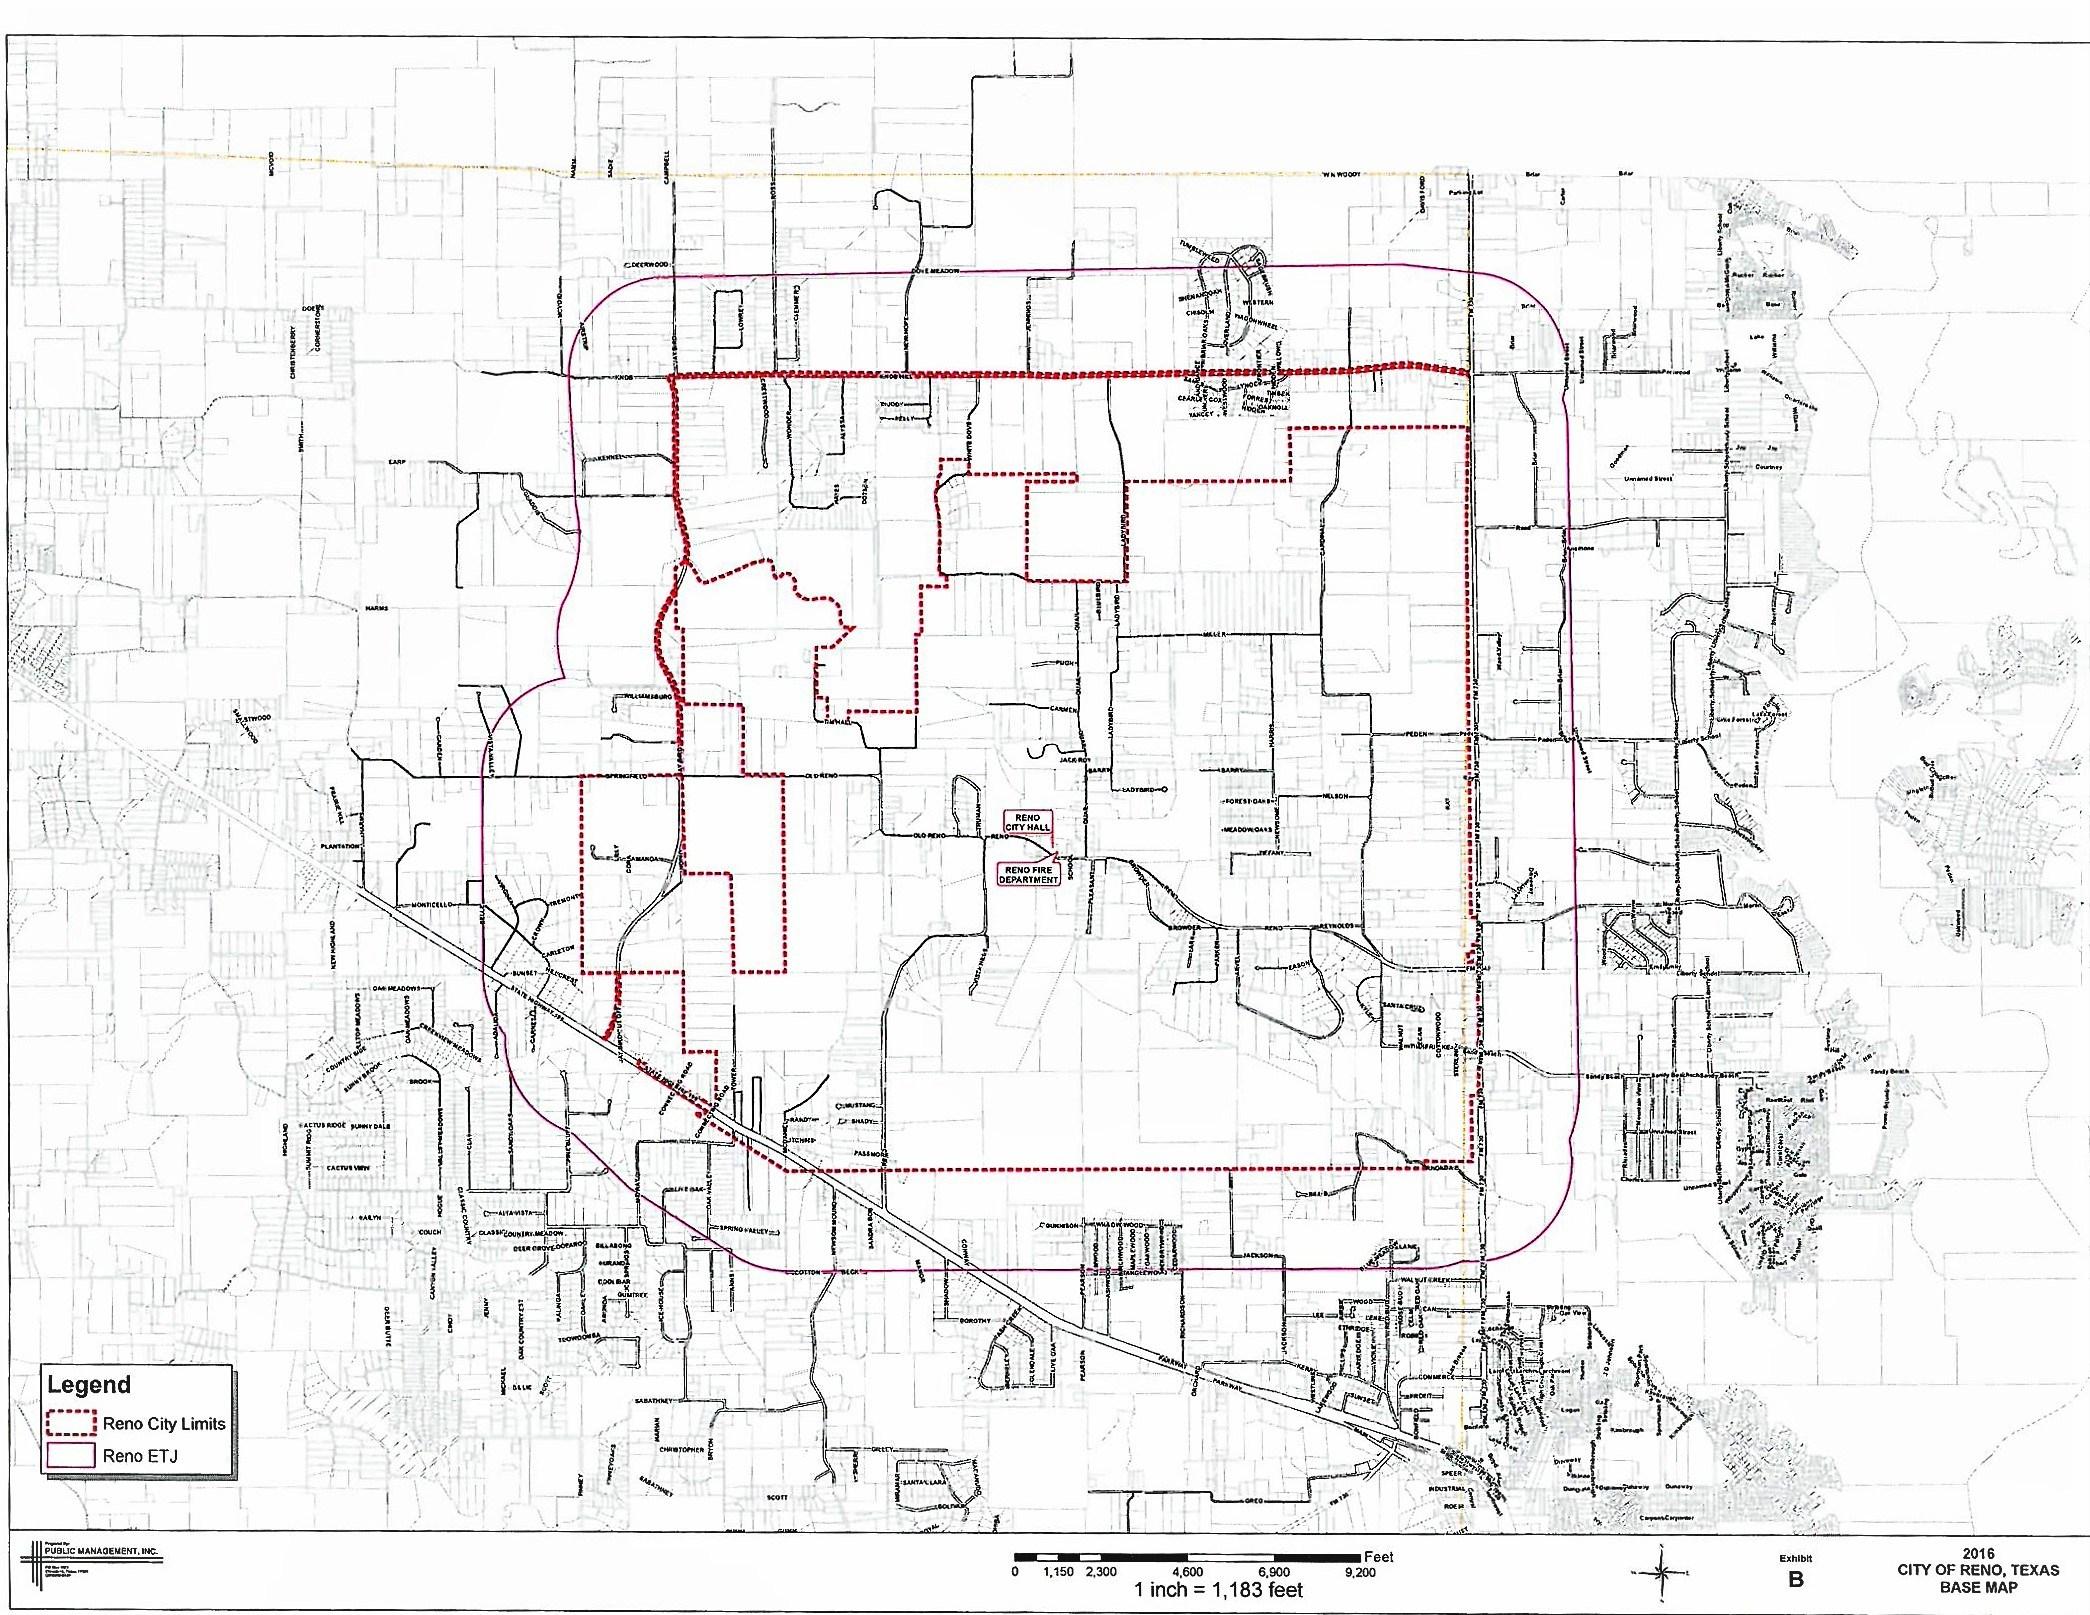 Southlake Texas Map Tx Map - Southlake Texas Map